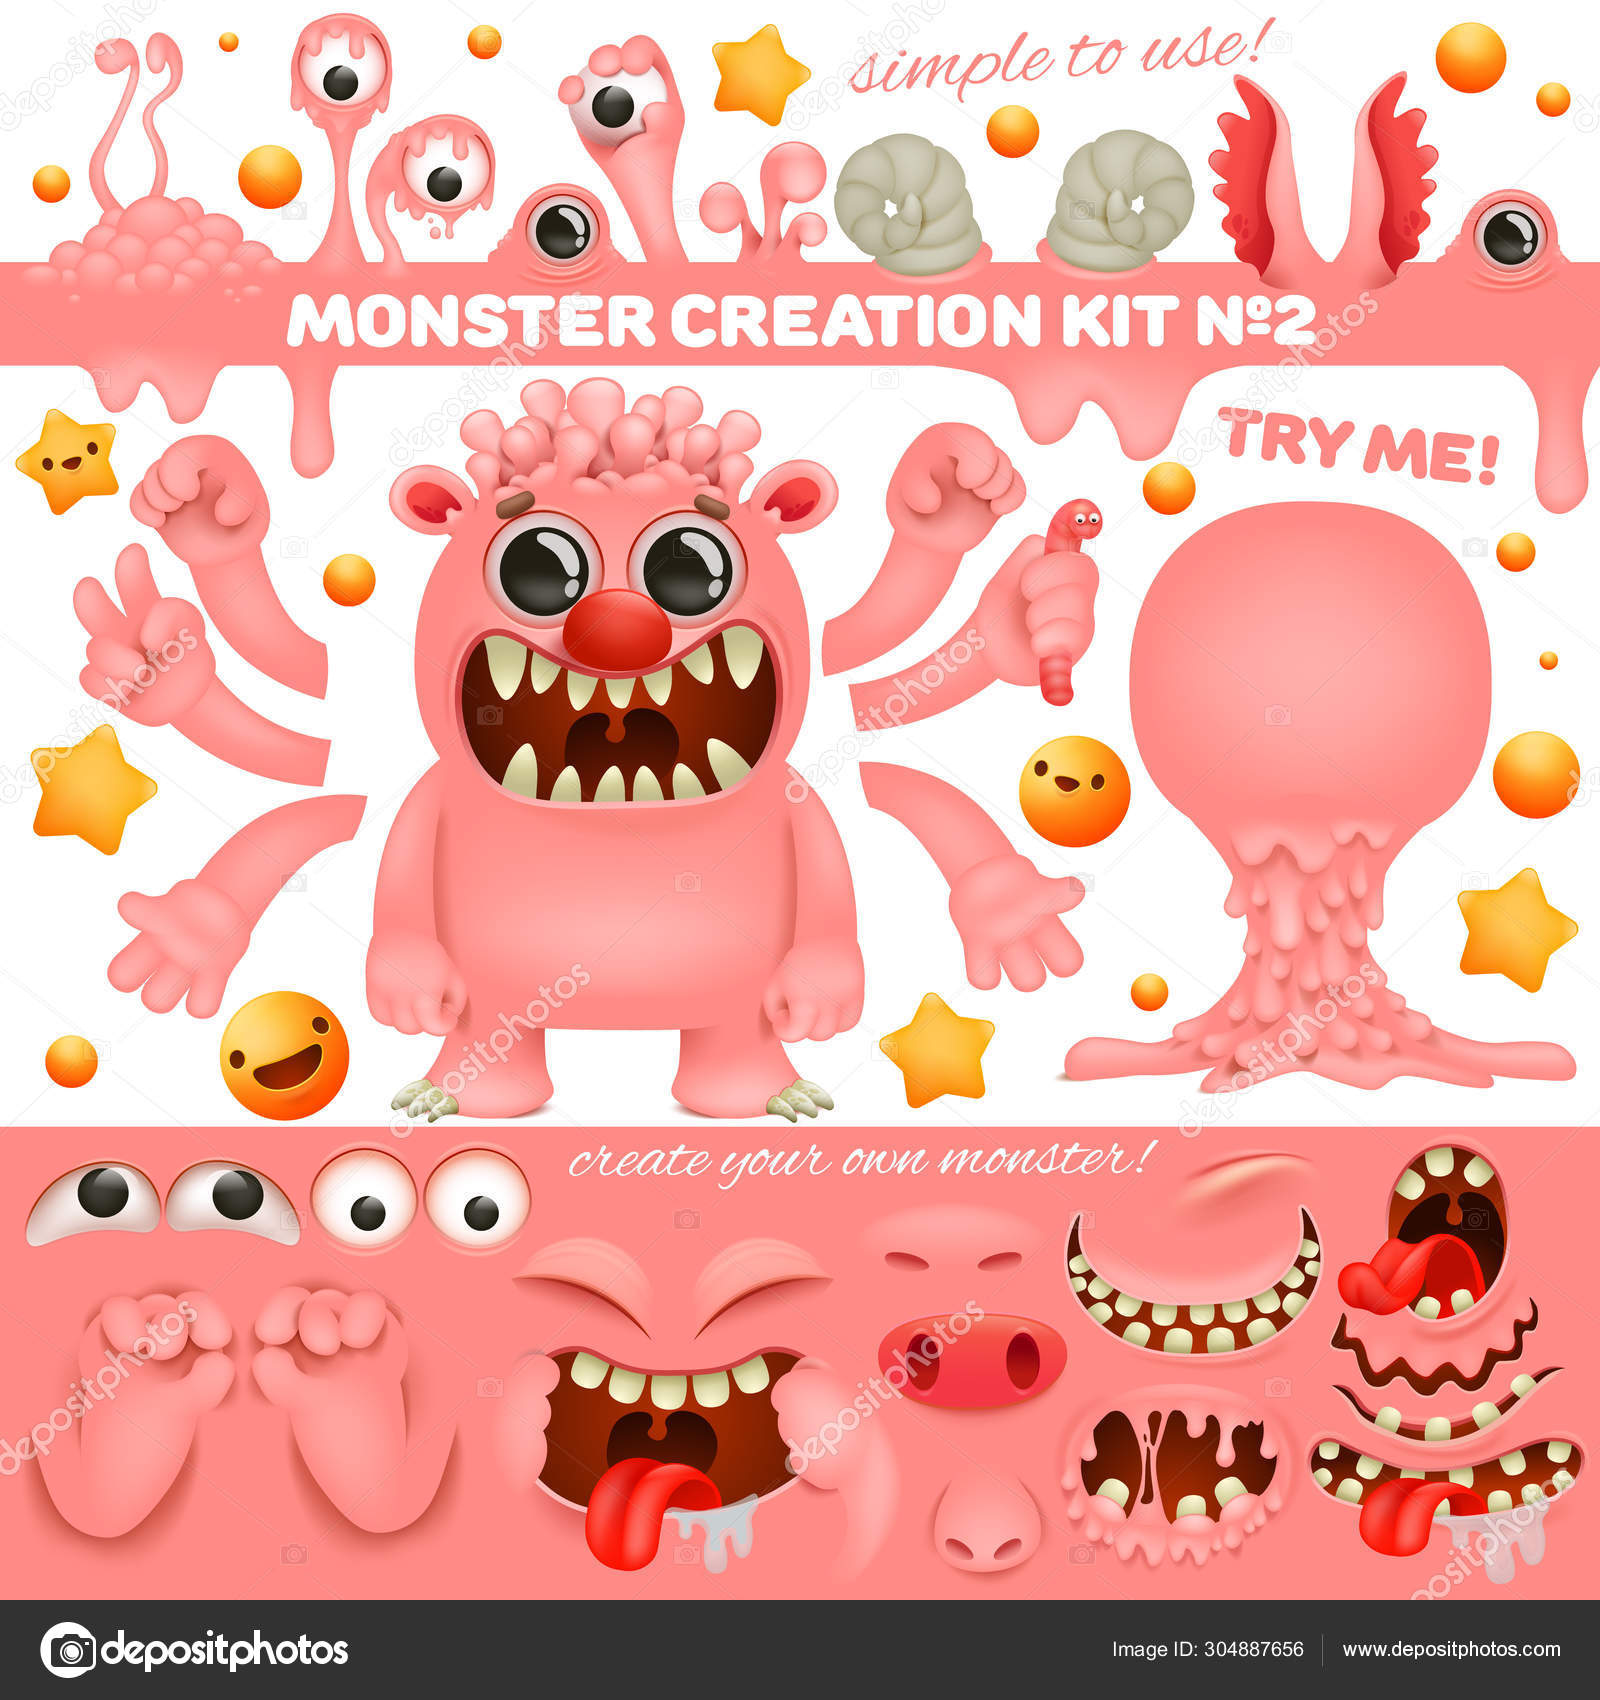 Pink Monster Emoji Cartoon Creation Kit Diy Collection Create Your Own Character Stock Vector C Nektoetkin 304887656